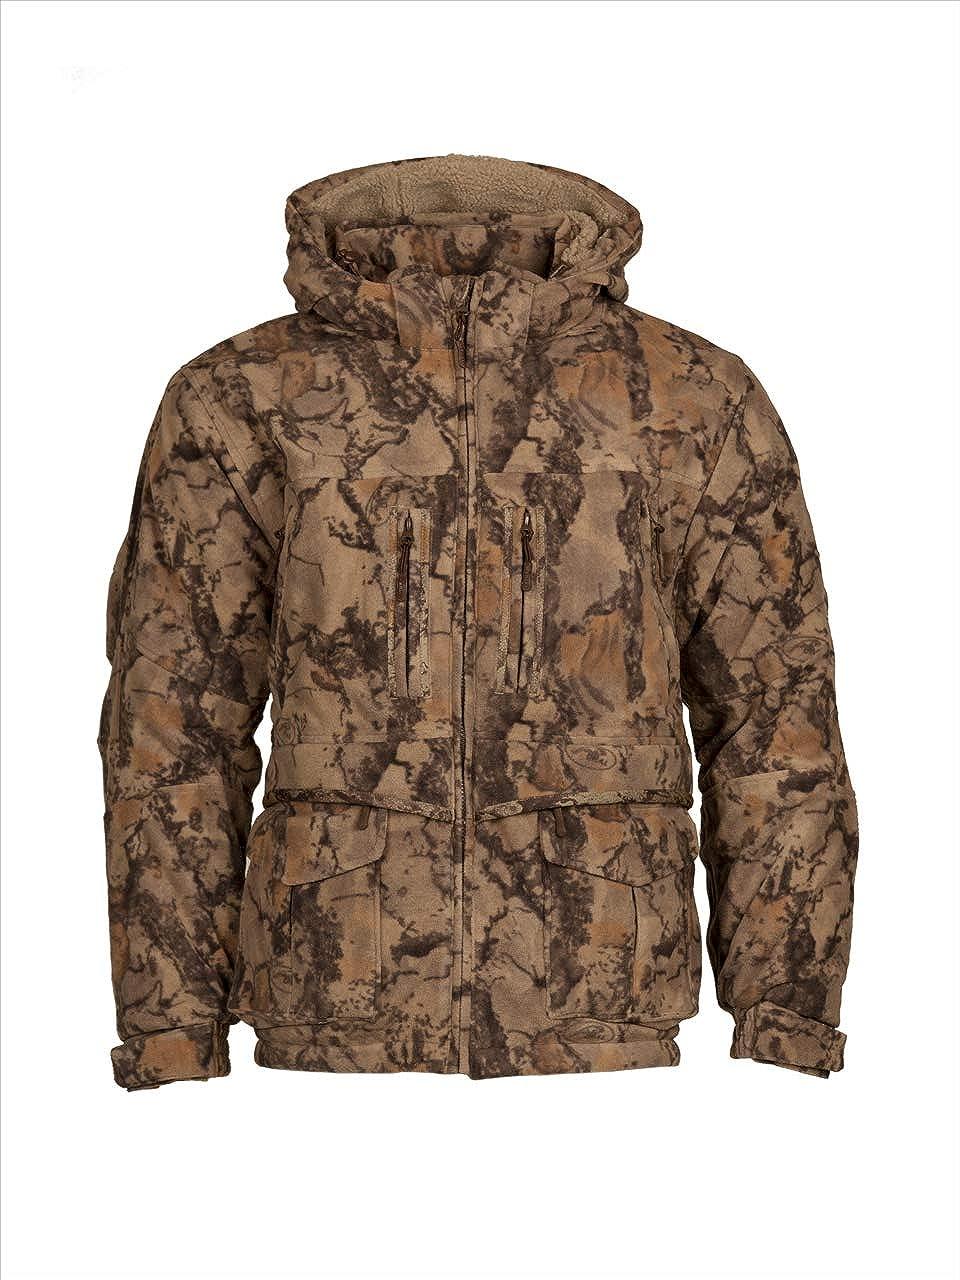 Windproof Full-Zip Fleece Parka Jacket for Men, Natural Camouflage Pattern, Men's Hunting Jacket - Natural Gear (Medium)